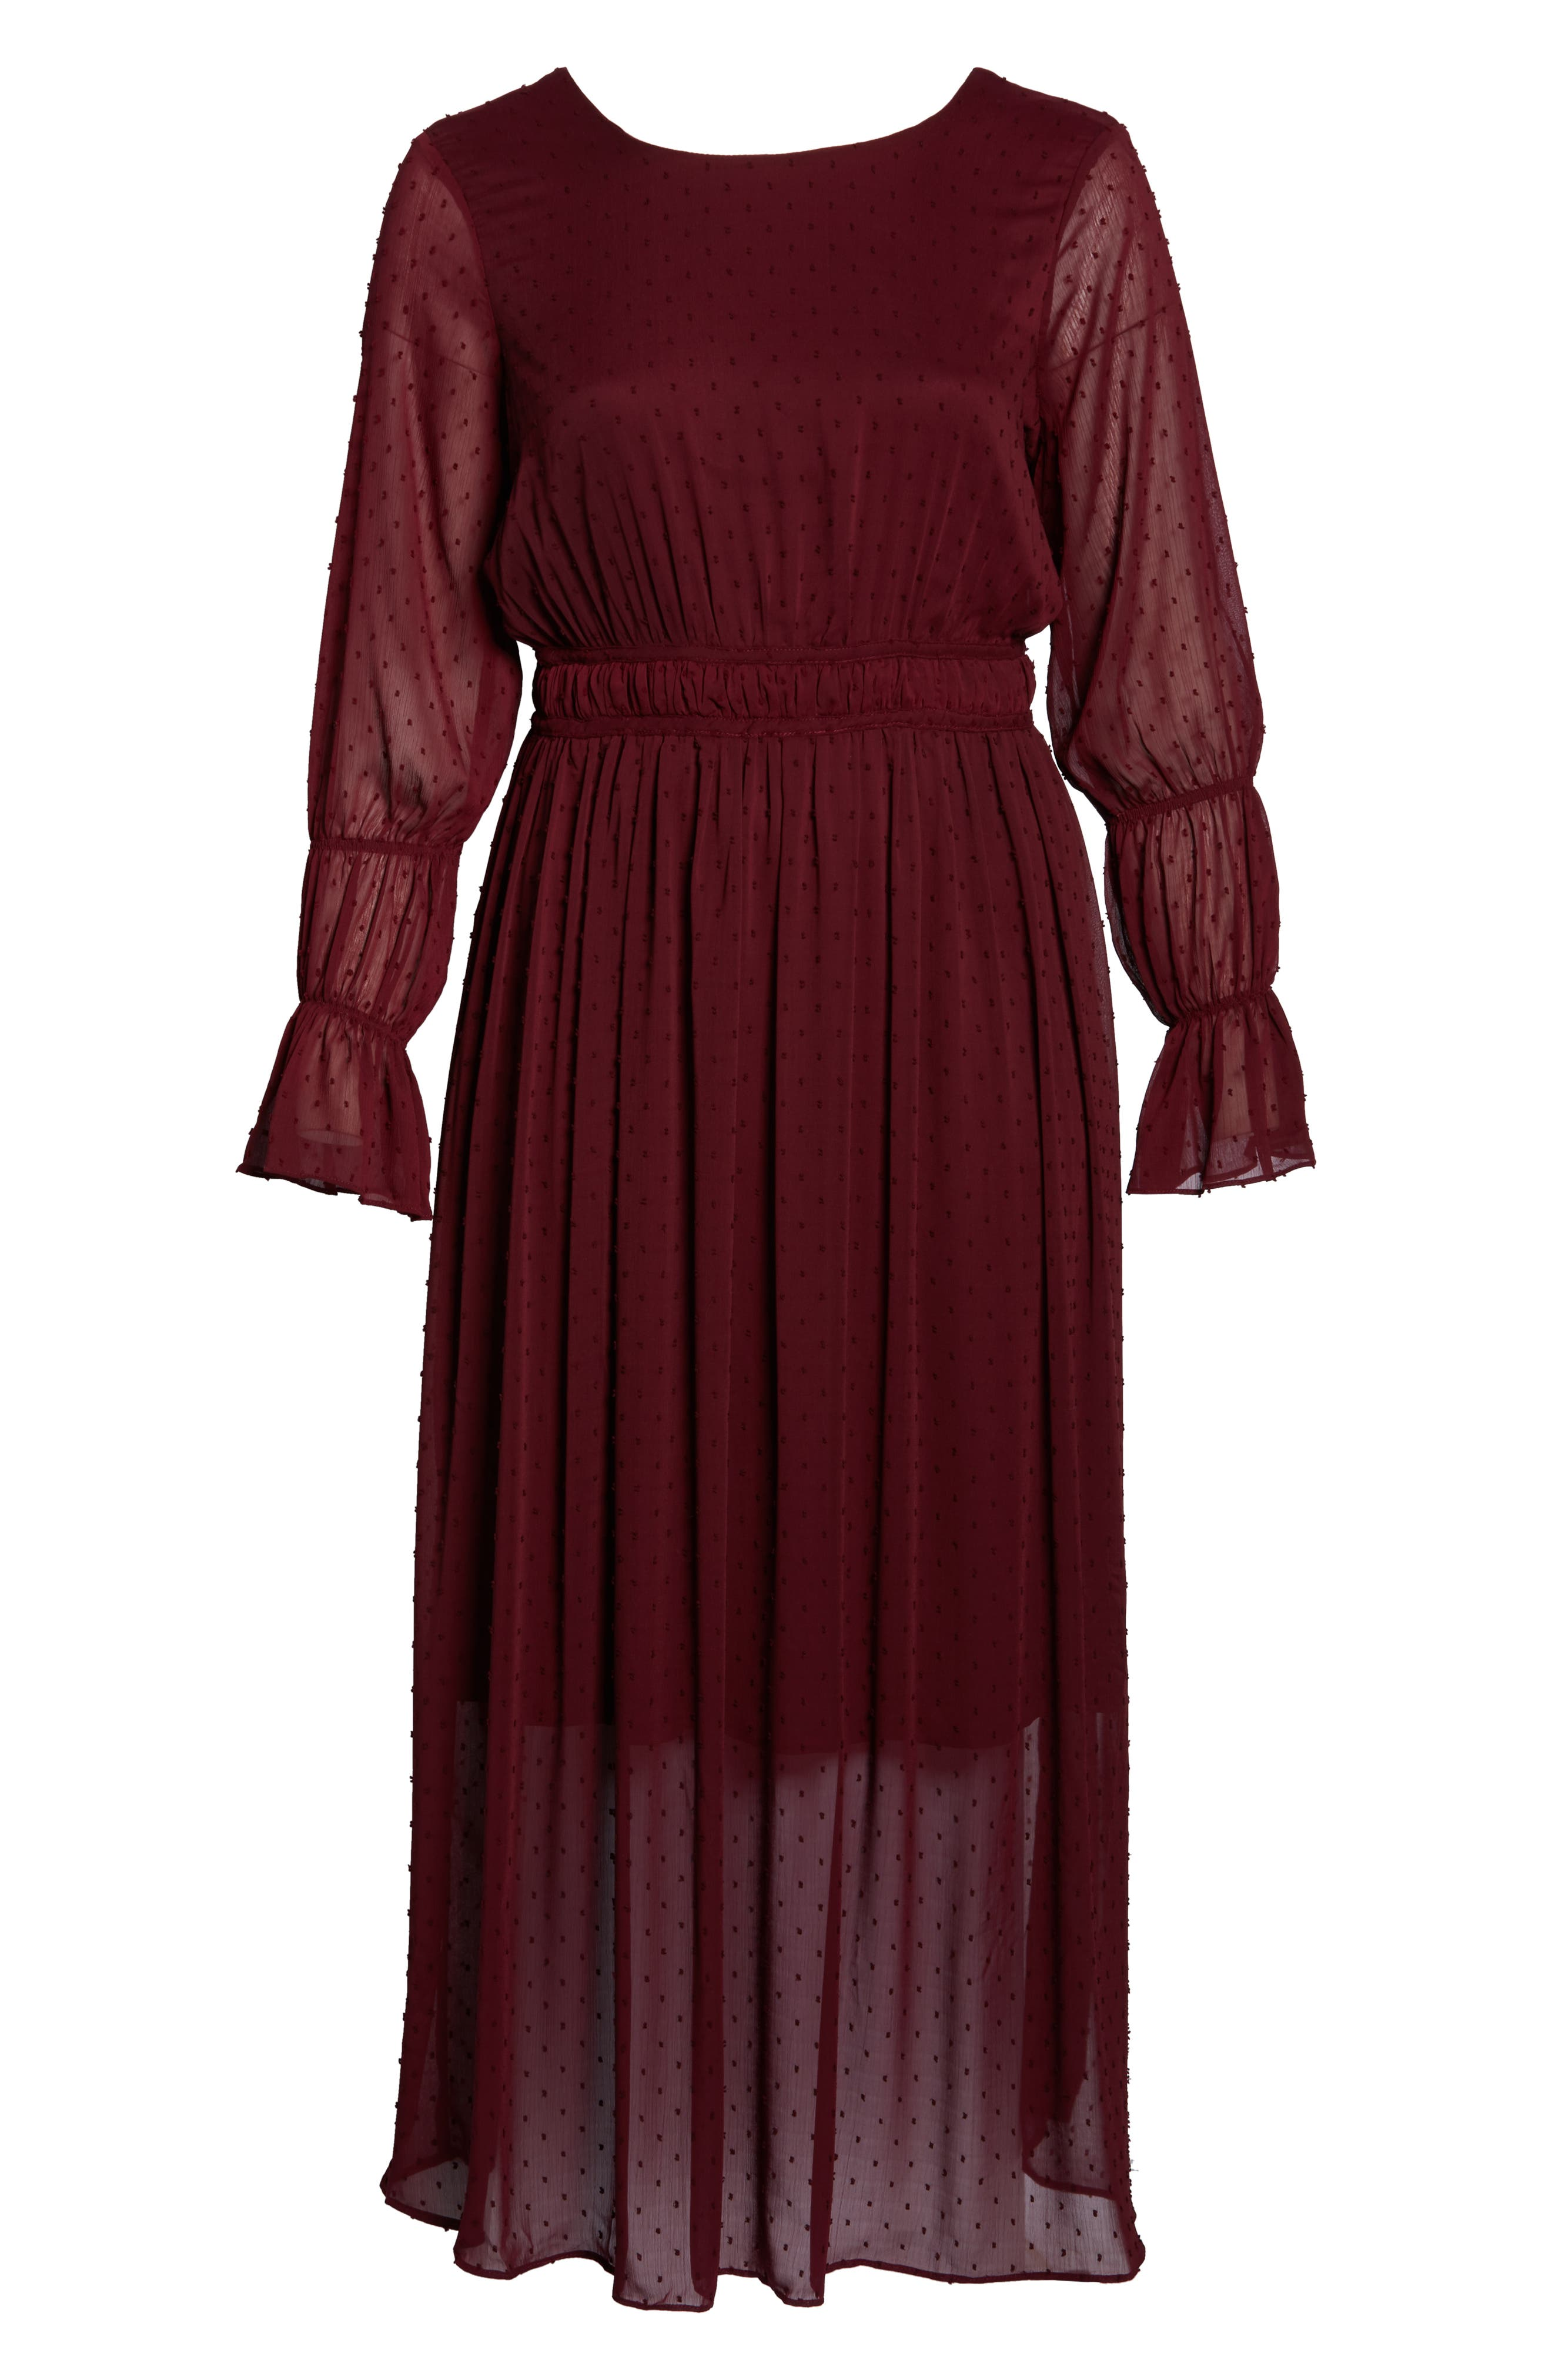 Dobby Maxi Dress,                             Alternate thumbnail 7, color,                             603